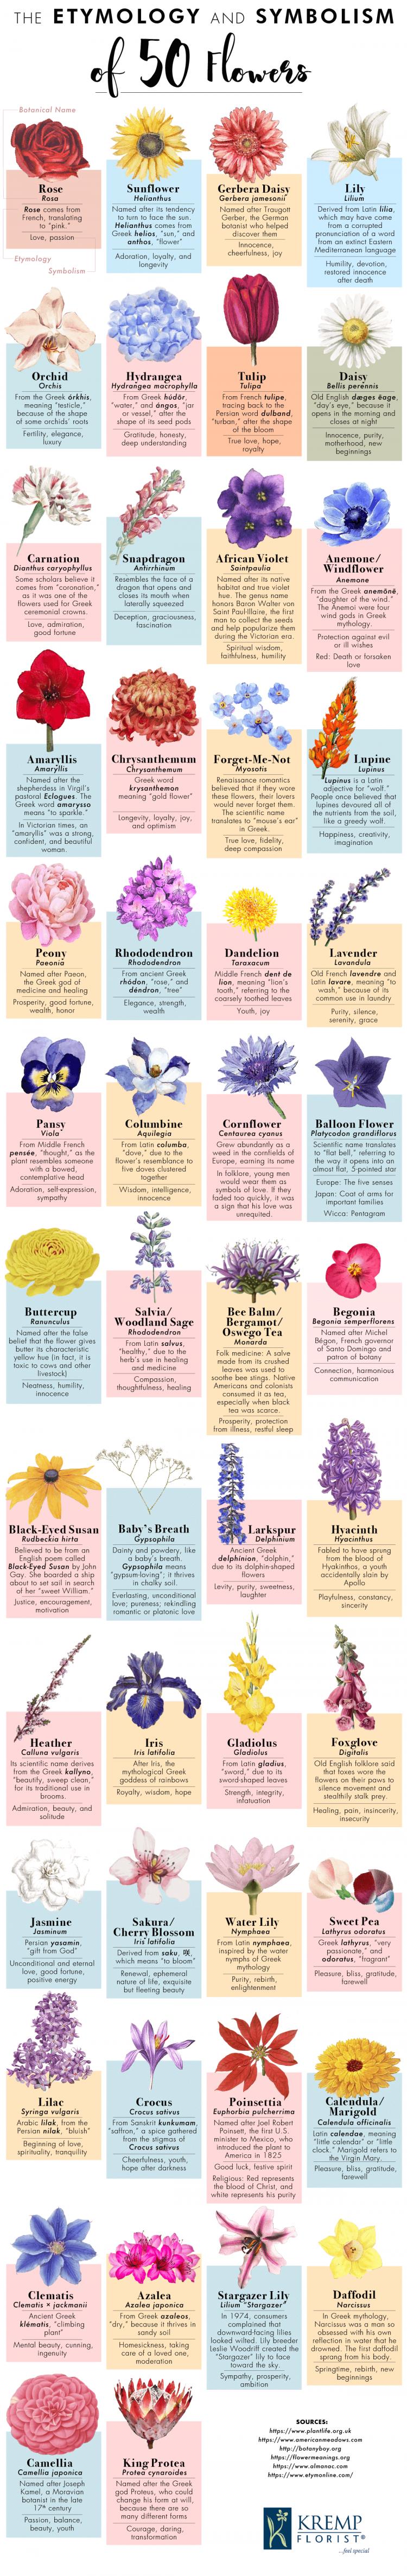 etymology-symbolism-50-flowers-5_compressed